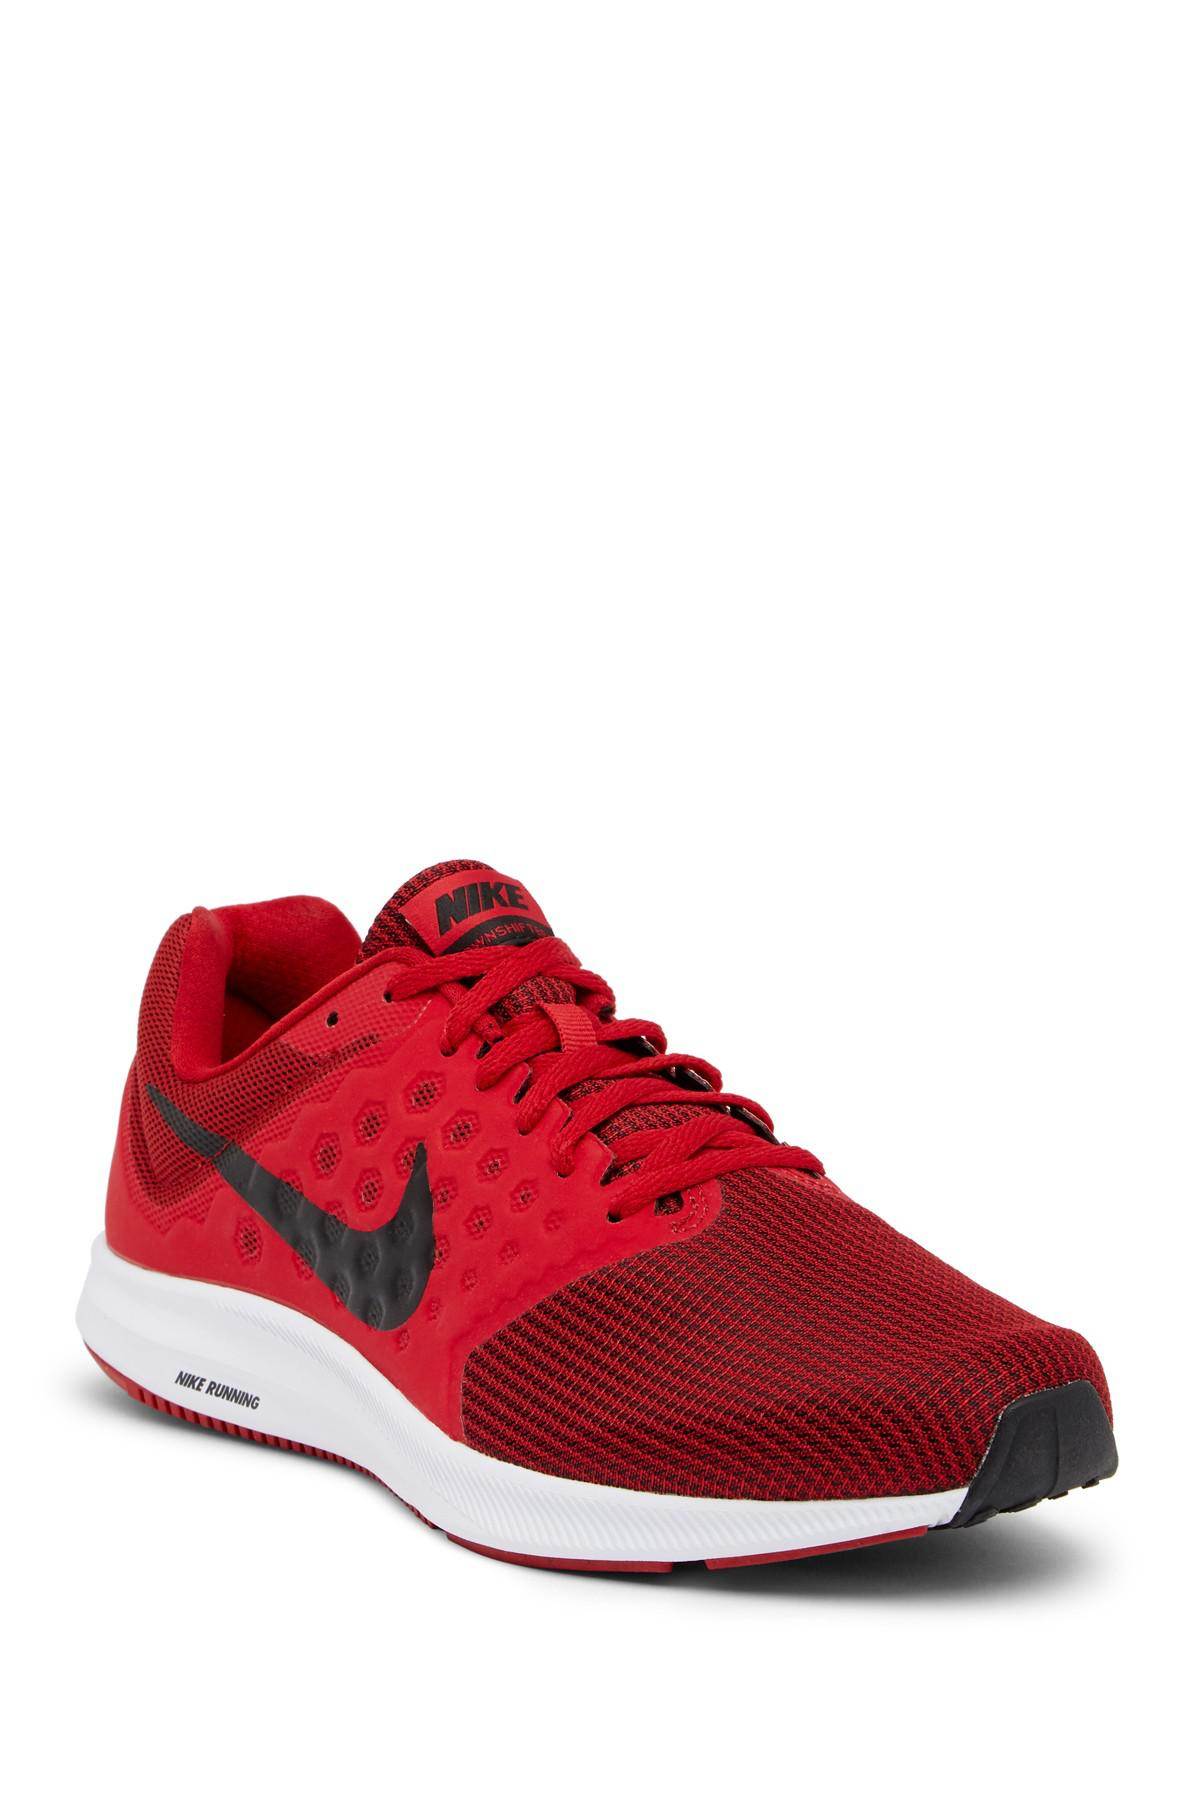 380e0e44b9 Lyst - Nike Downshifter 7 Sneaker in Red for Men